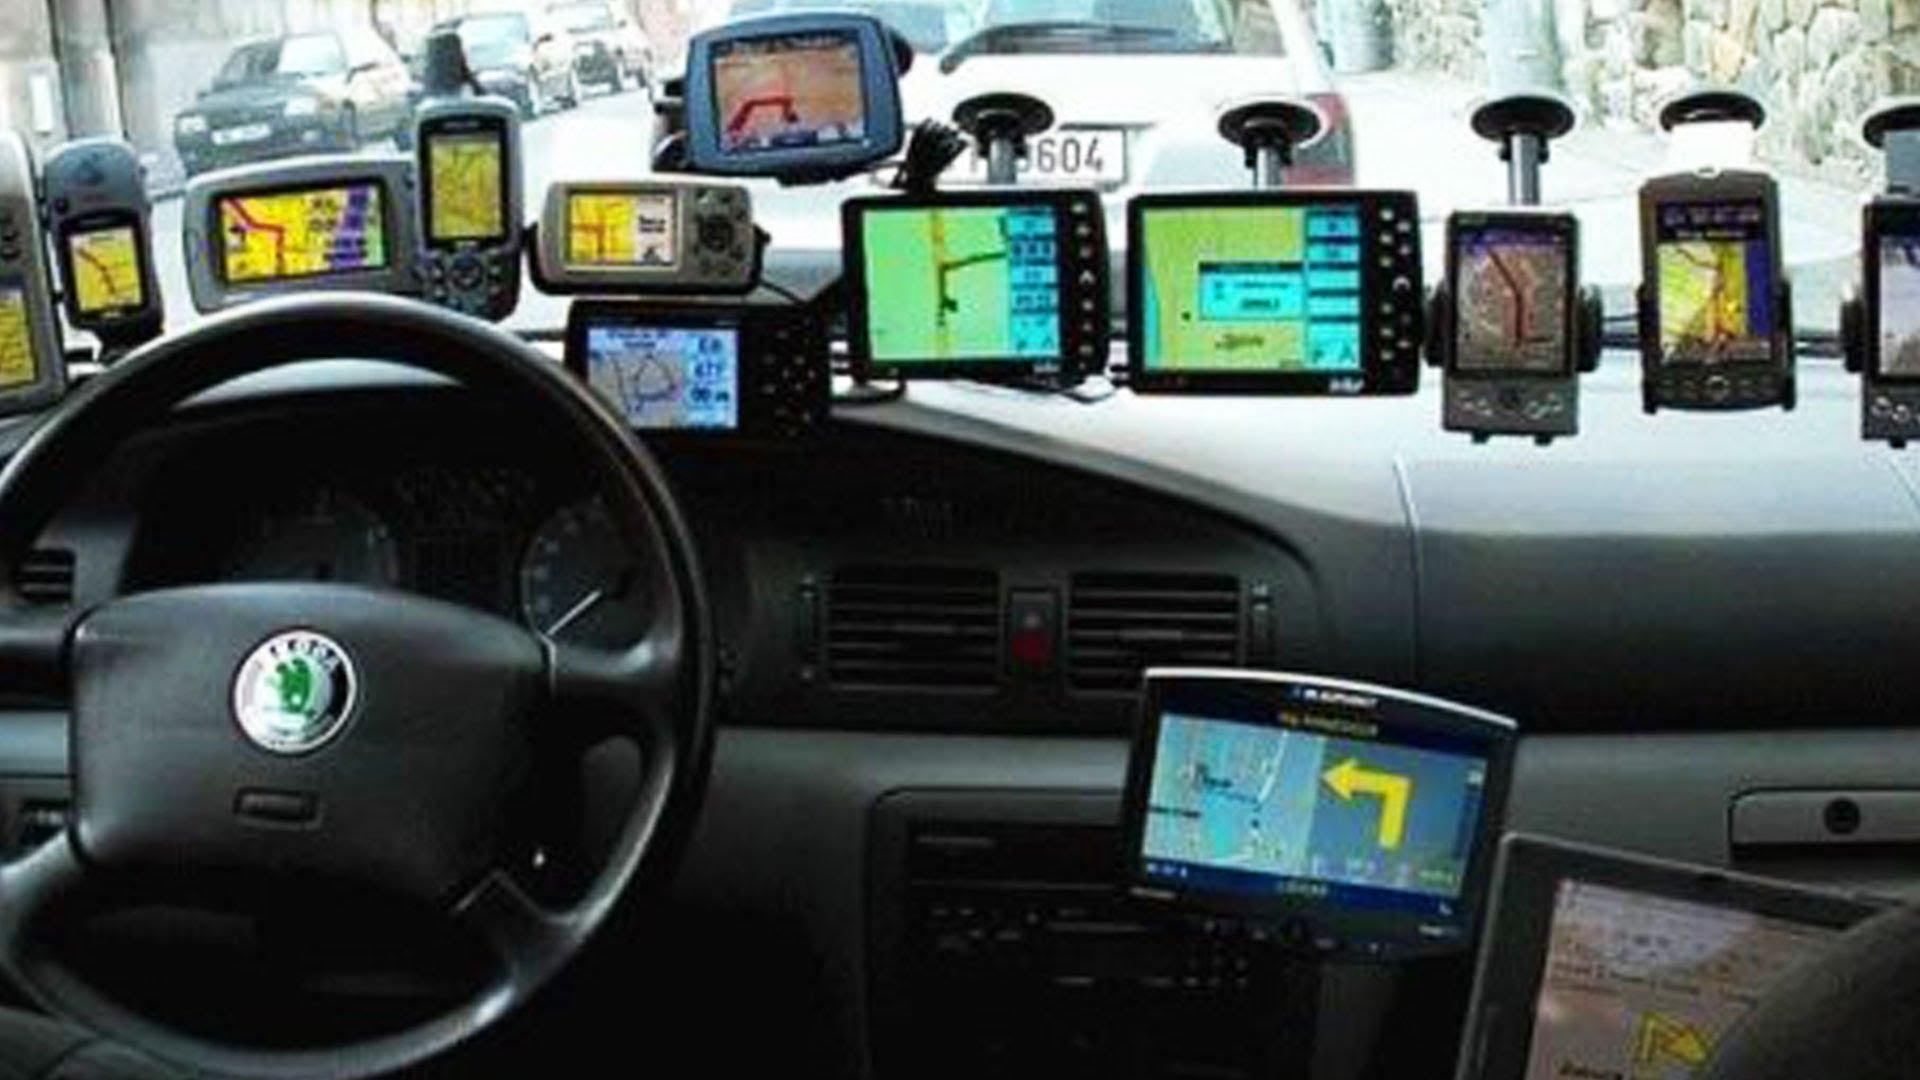 GPS navigators,  GPS fails